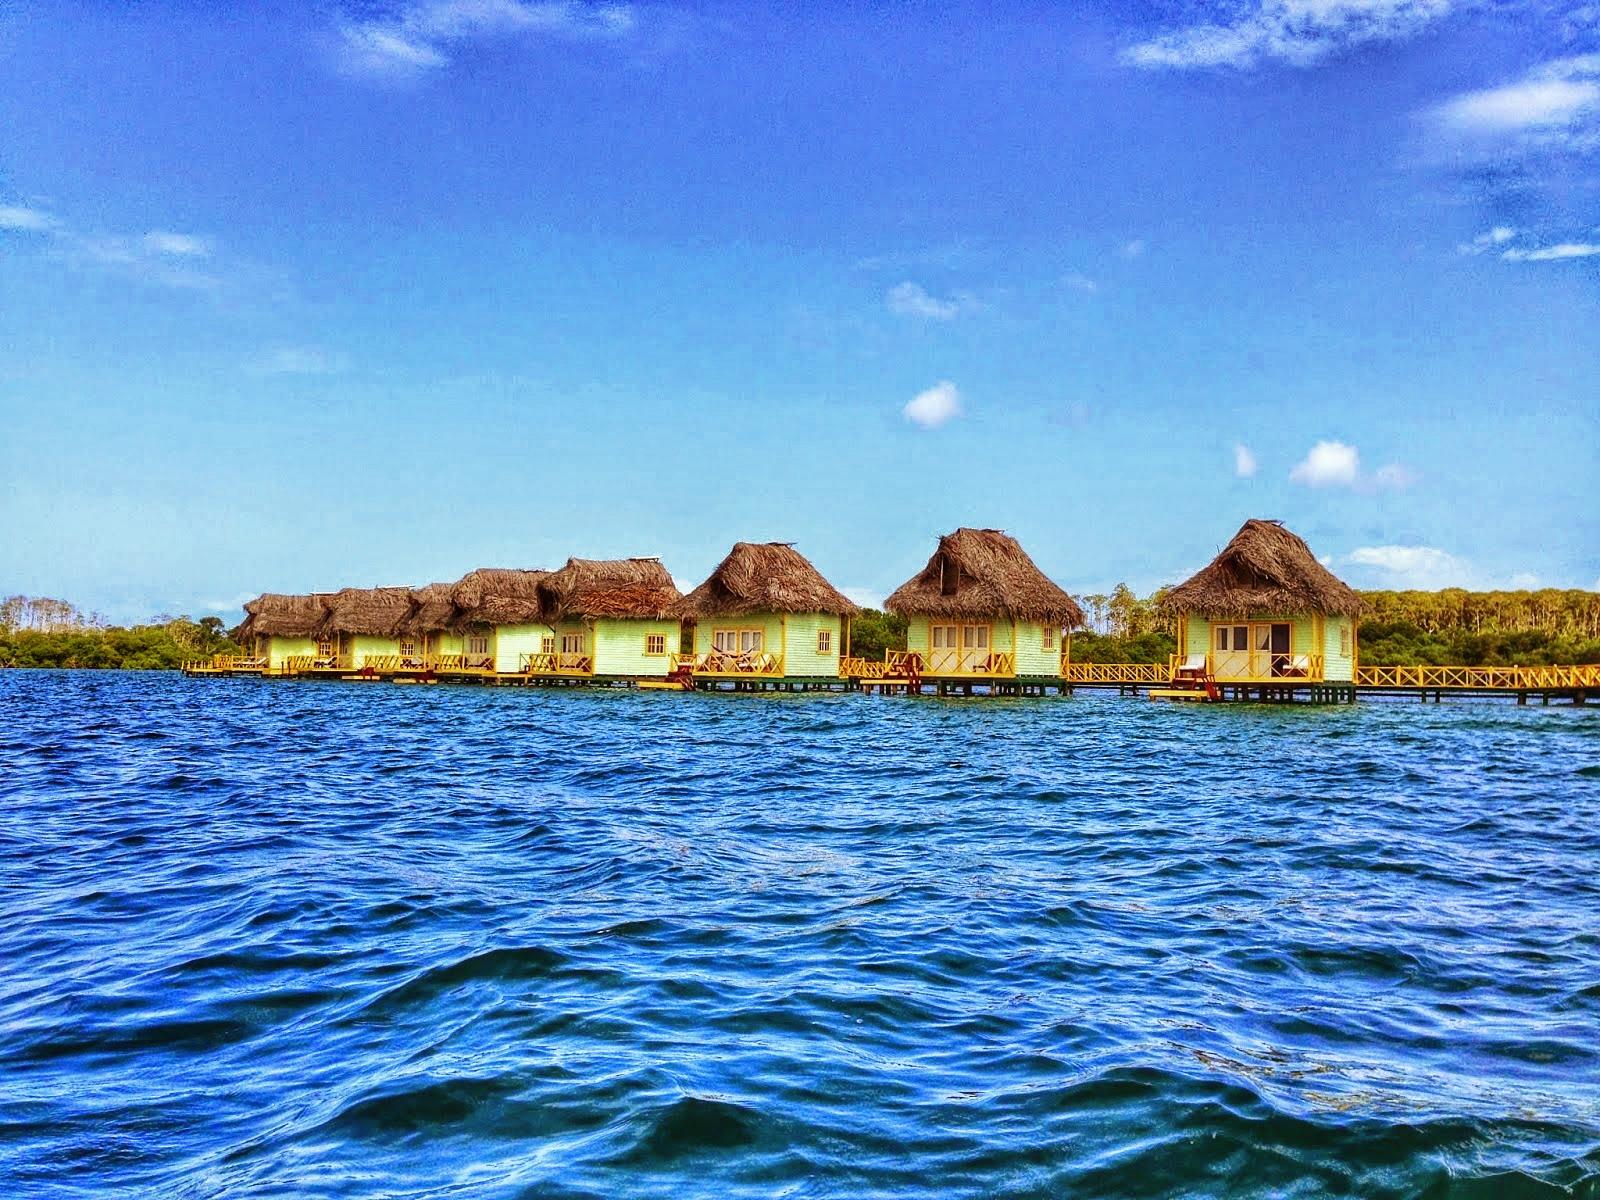 Hotel Punta Caracol Acqua Lodge - Bocas del Toro - Panamá